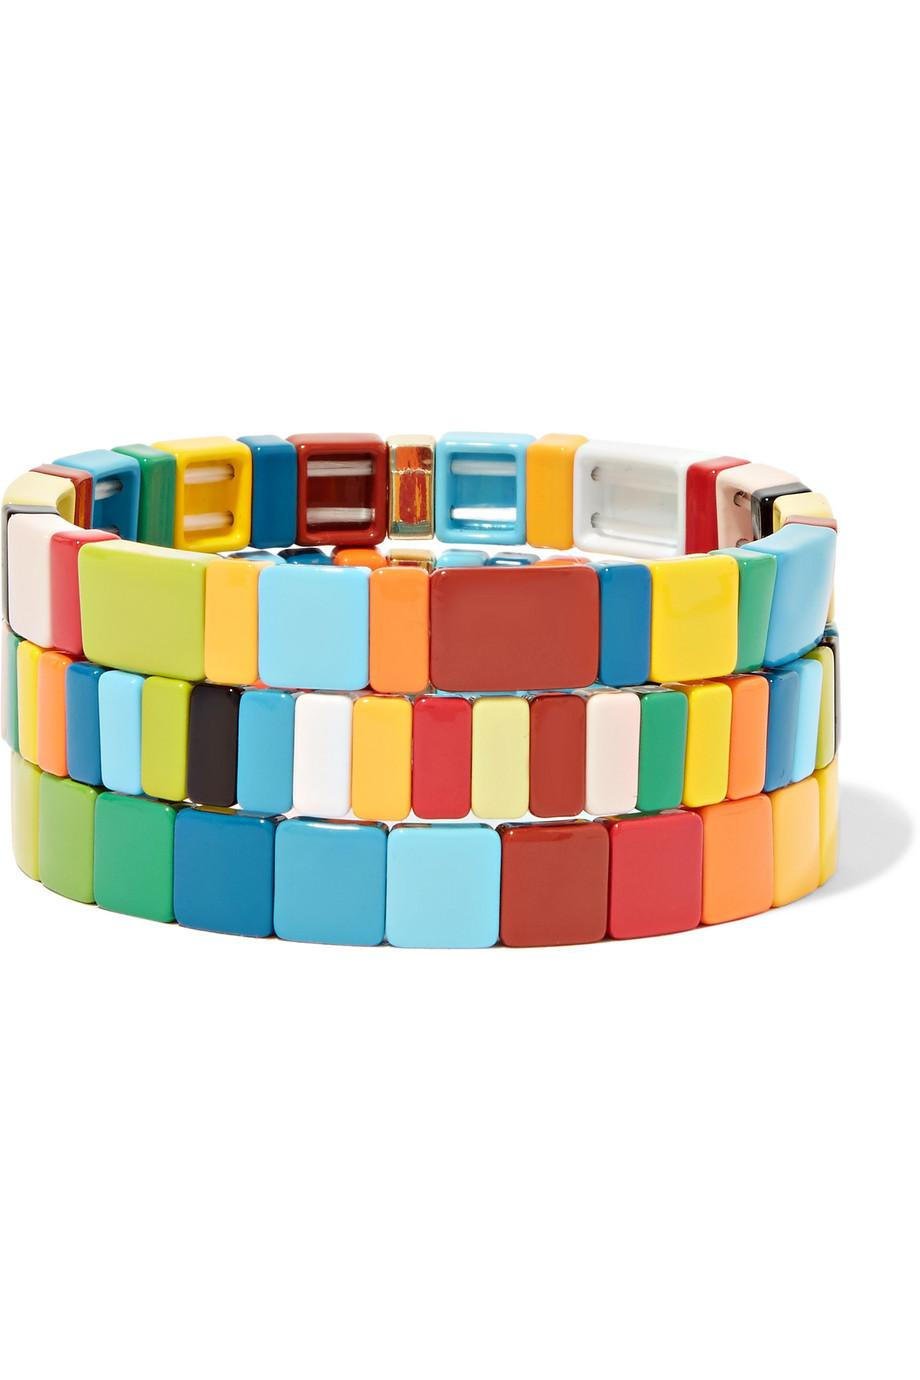 Roxanne Assoulin Set of Three Starburst Block Party Enamel Bracelets sOqFwq